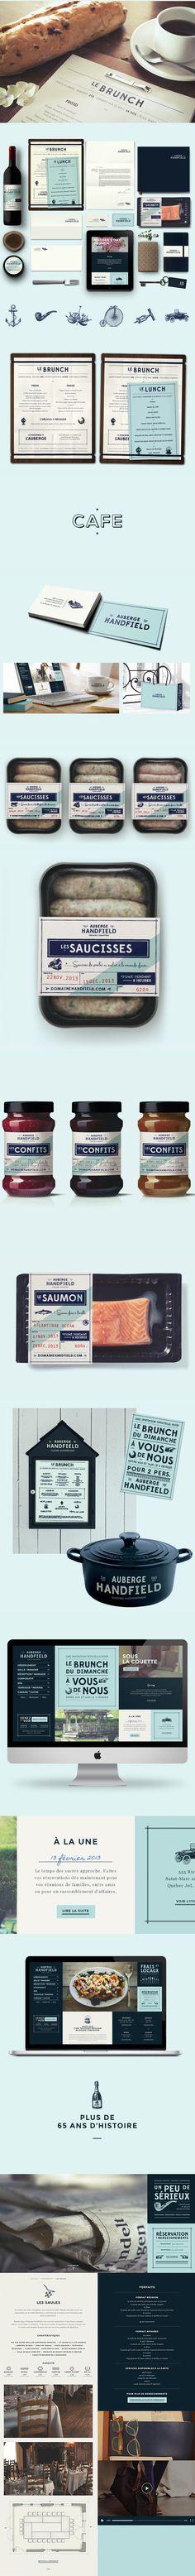 restaurants inspiration / branding | Auberge-Handfield Cuisine